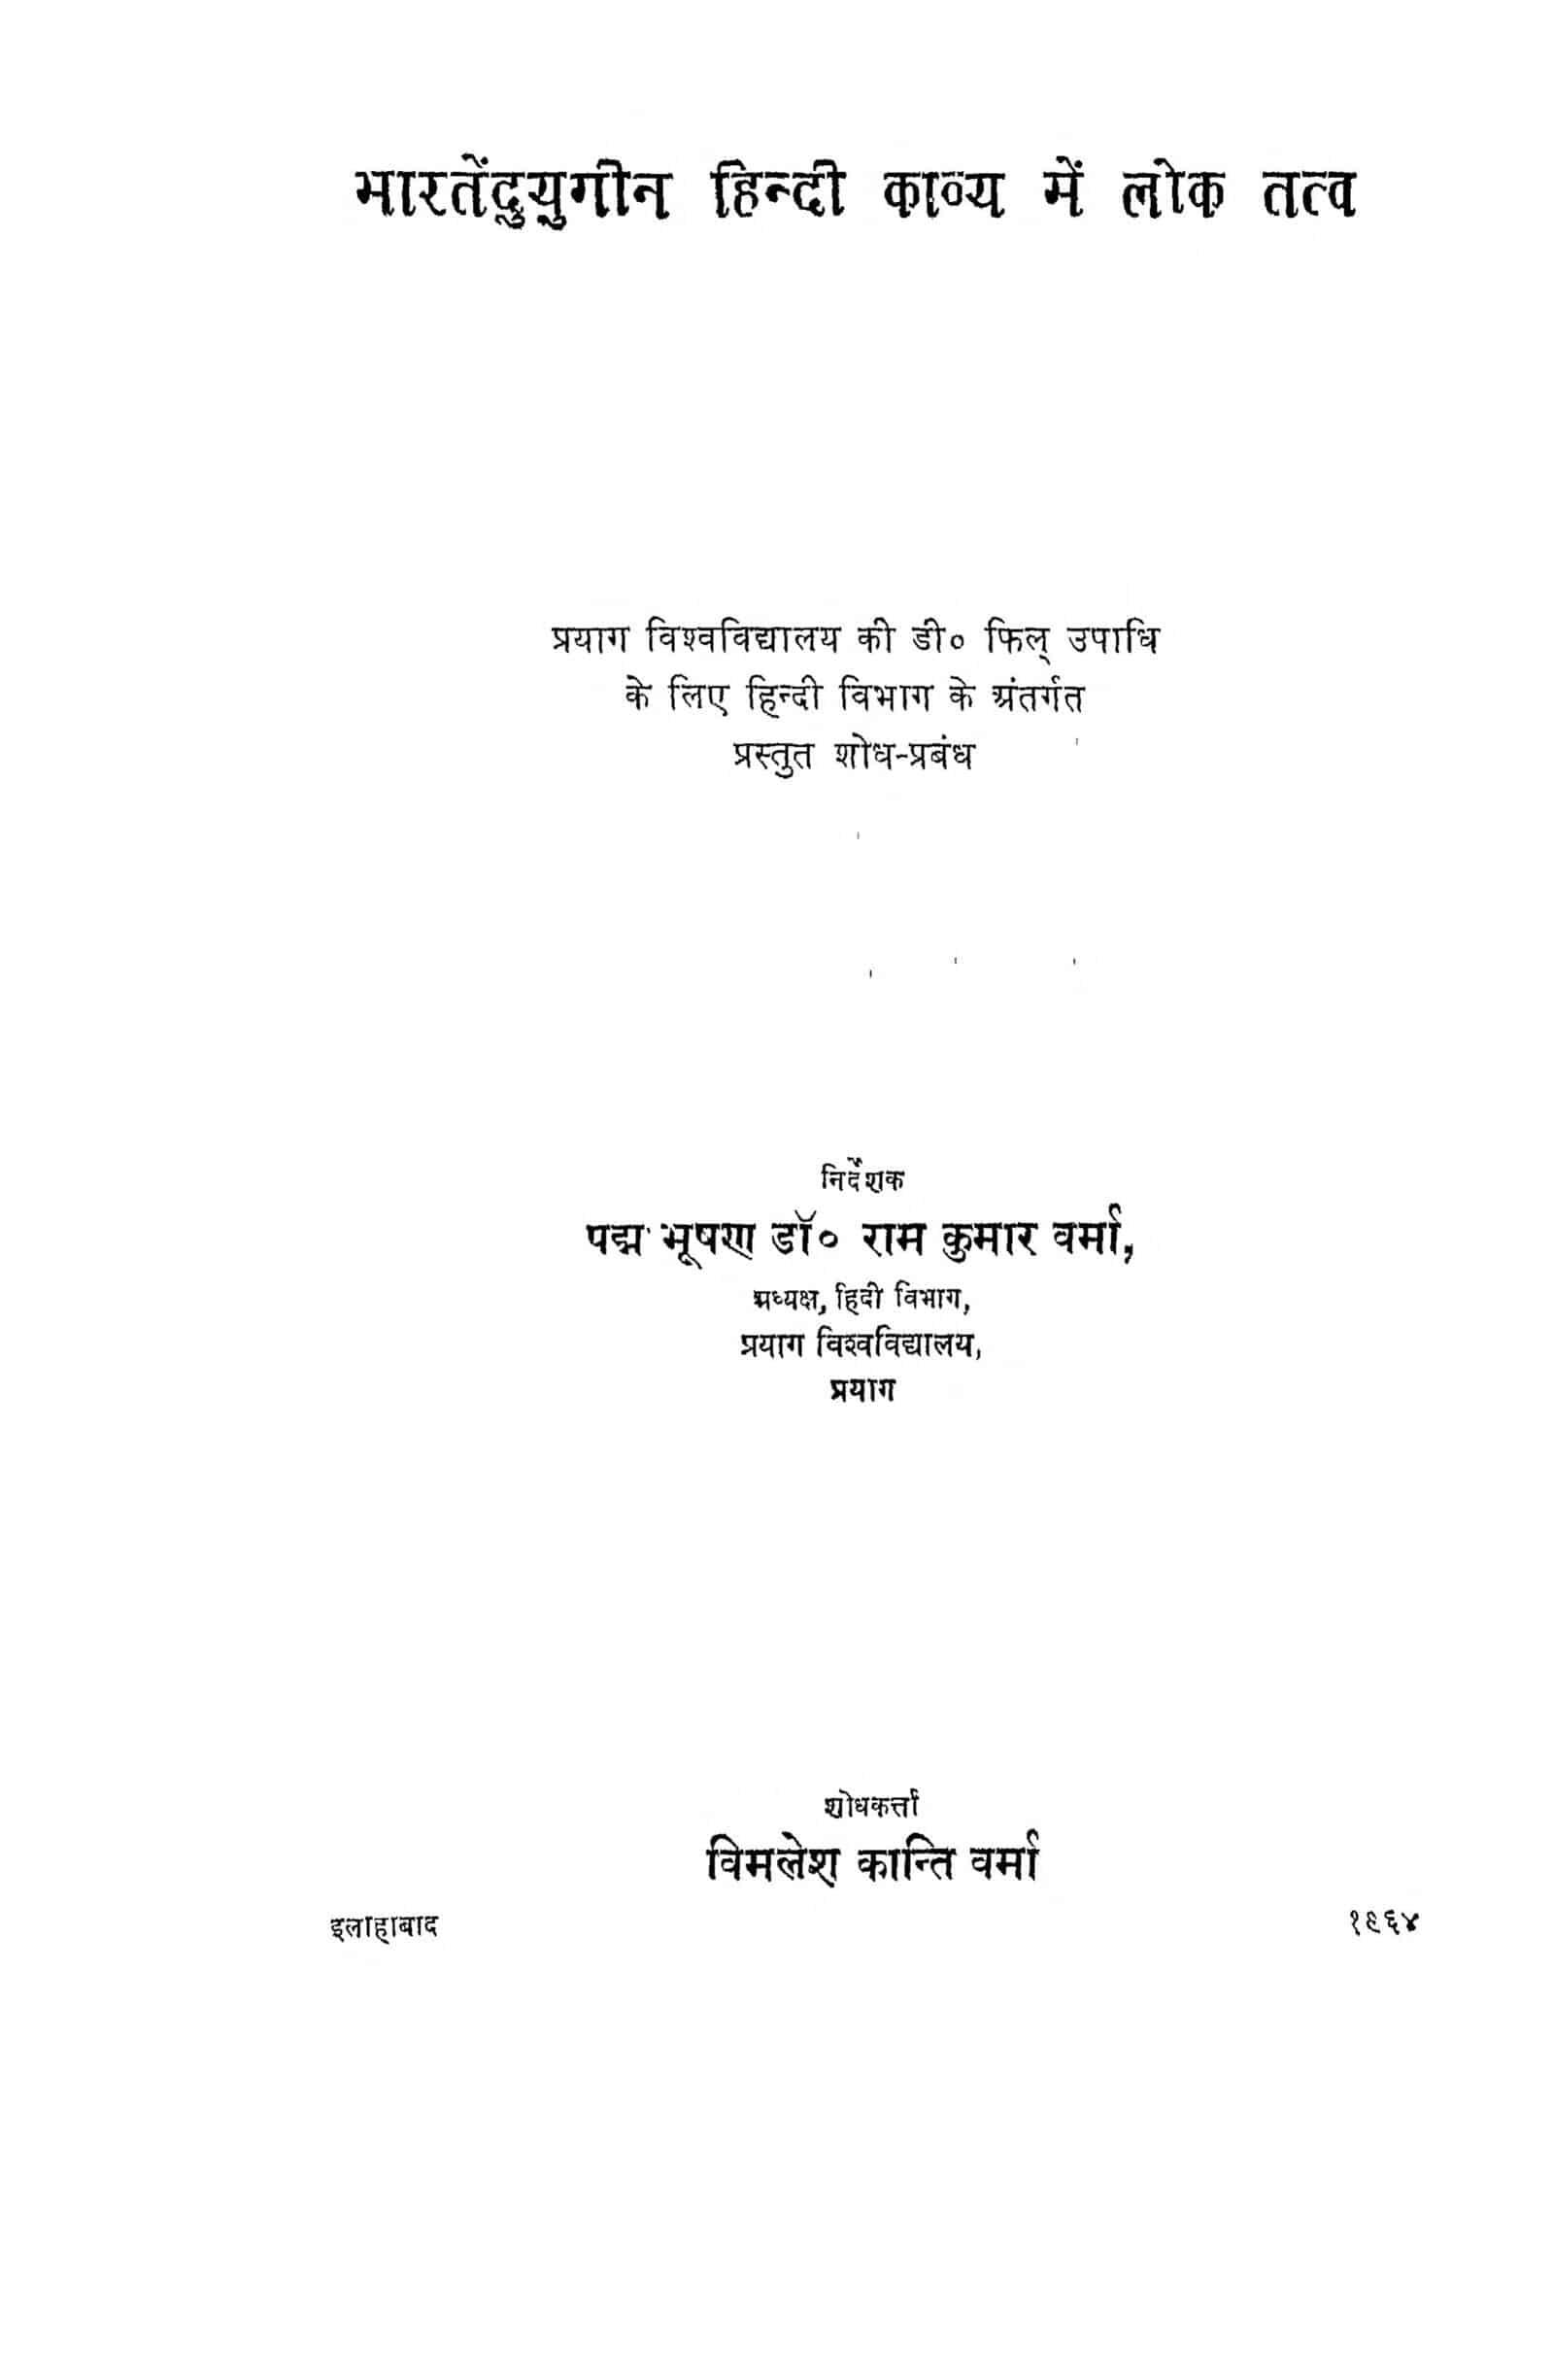 Book Image : भारतेन्दुयुगीन हिन्दी काव्य में लोक तत्व  - Bhartenduyugin Hindi Kavya Men Lok Tatw